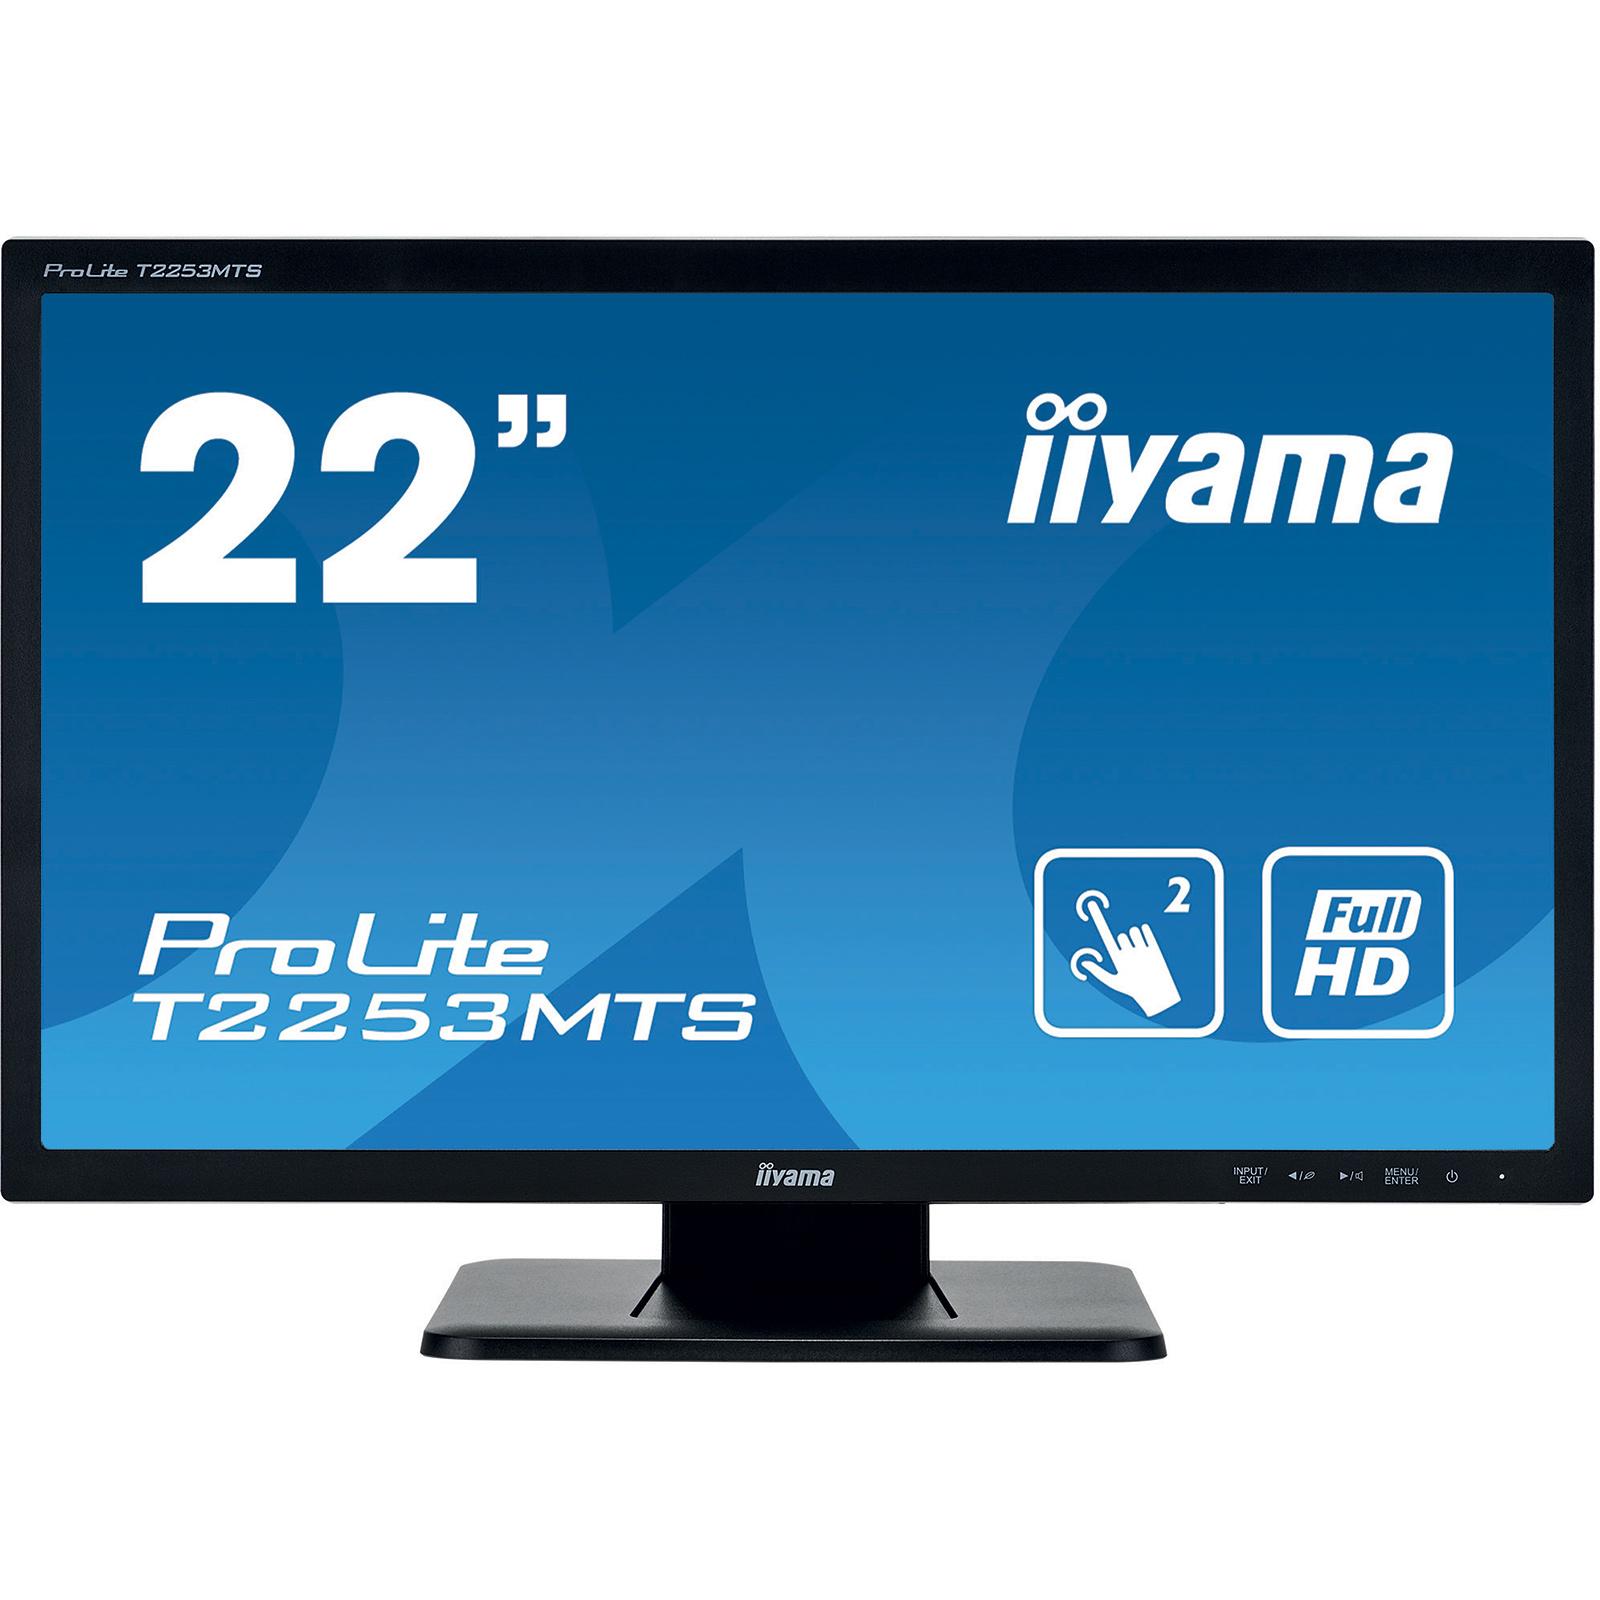 "Ecran PC iiyama 22"" LED Tactile - ProLite T2253MTS-B1 1920 x 1080 pixels - Tactile MultiTouch - Dalle TN - 2 ms - Format large 16/9 - HDMI - Hub USB - Noir"